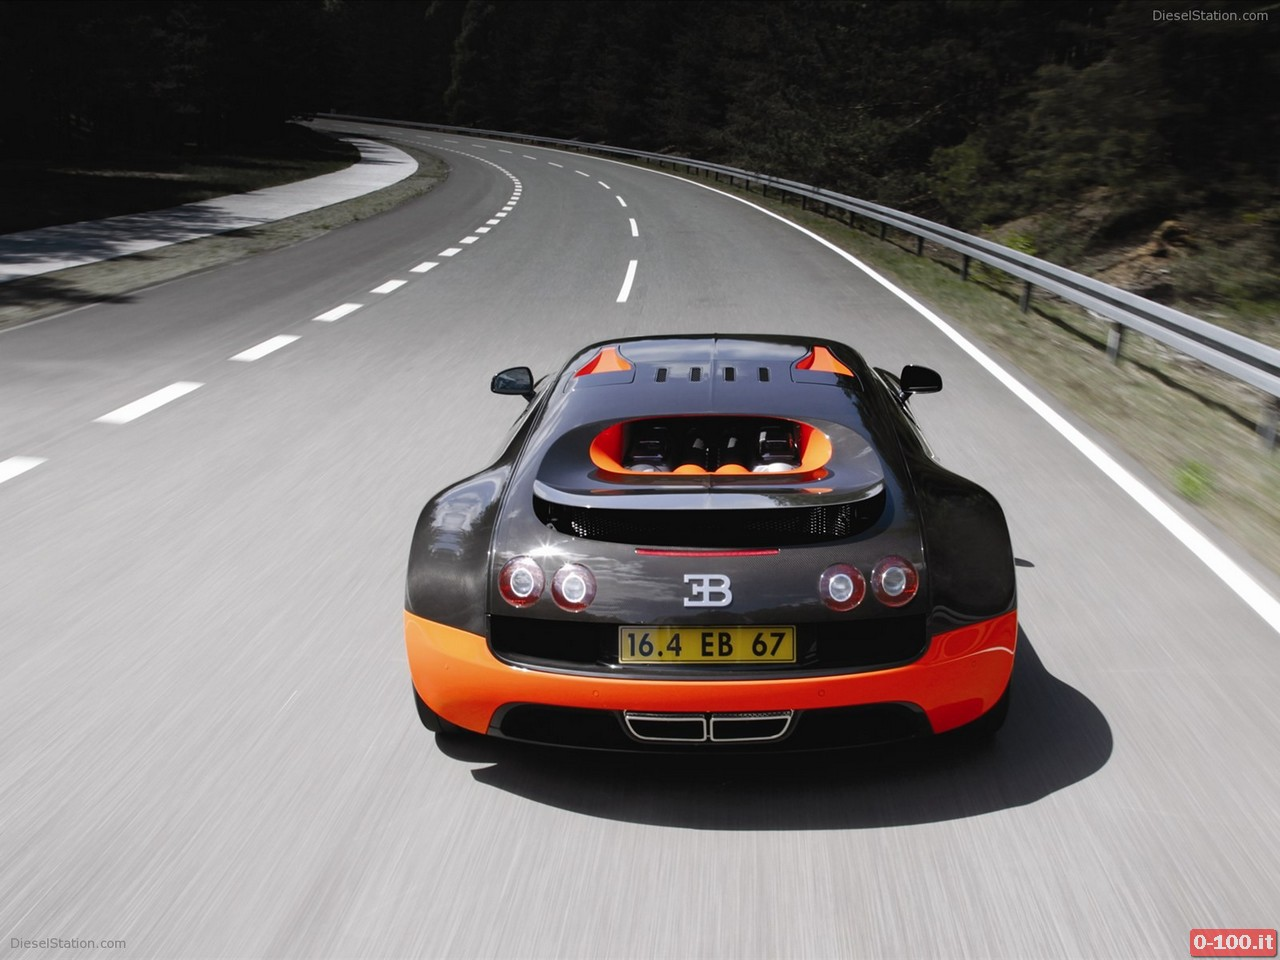 bugatti-veyron-supersport-guinness-world-records_0-100_2